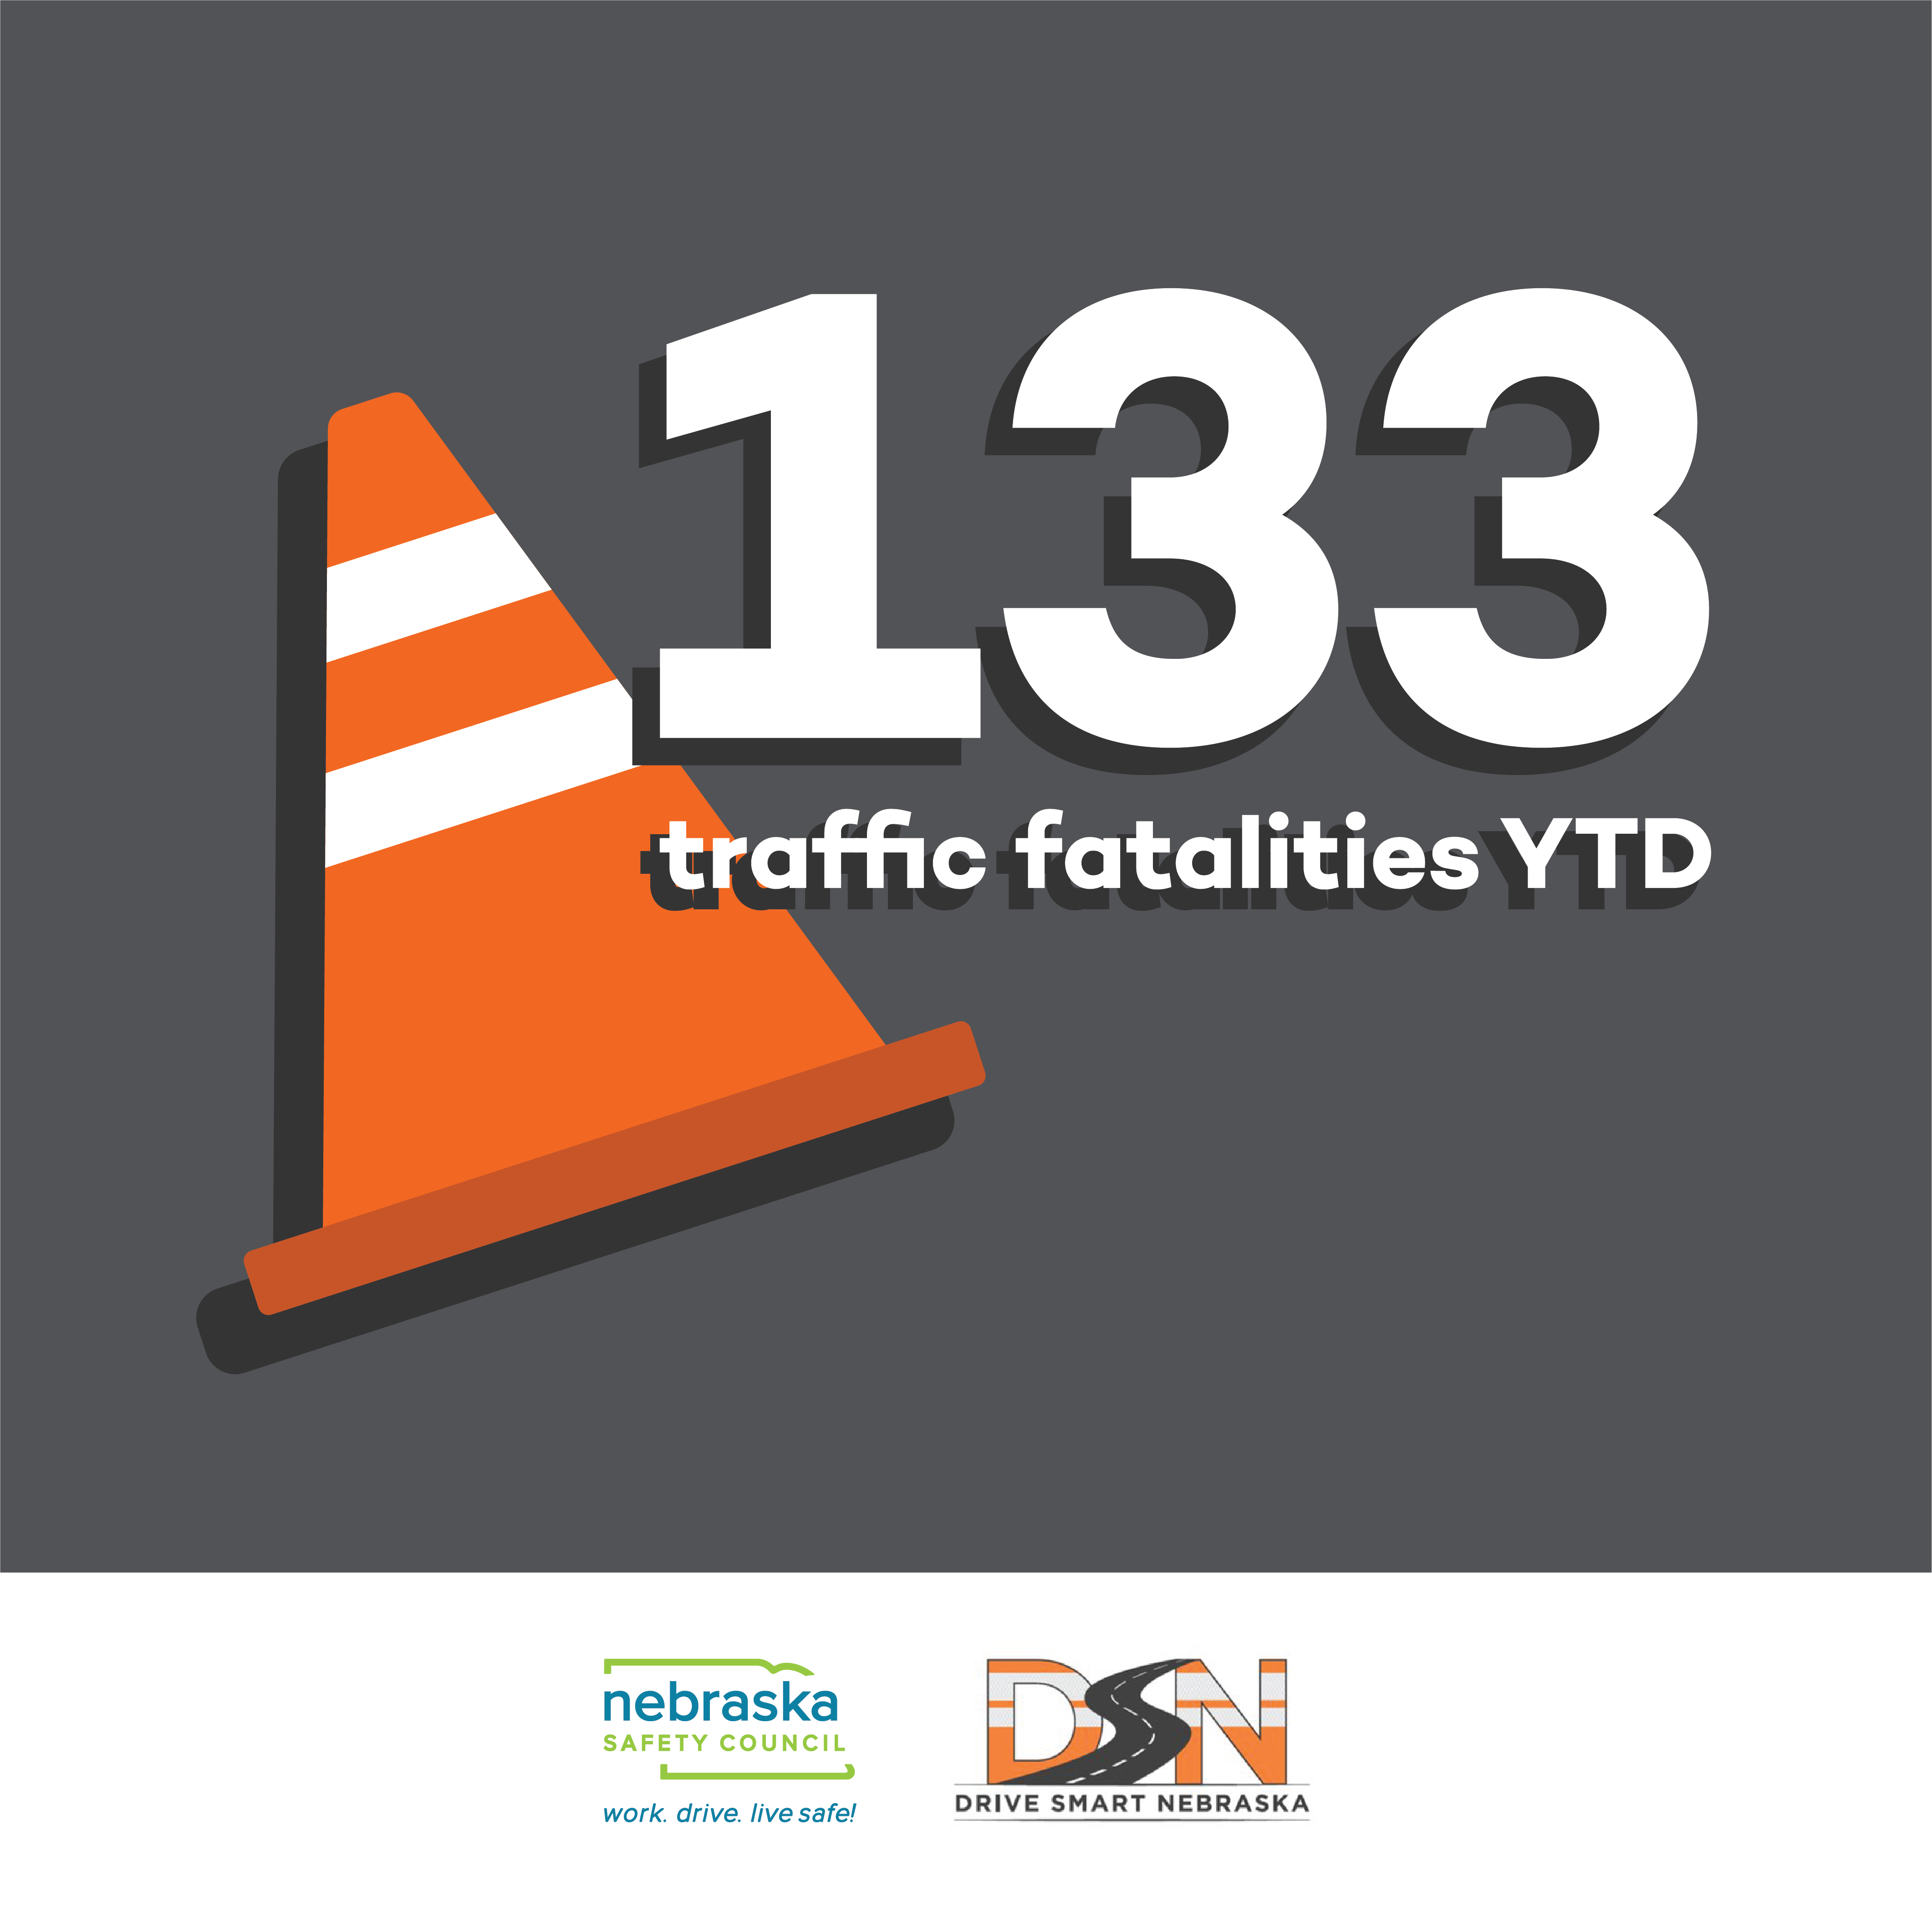 Road fatalities Nebraska Safety Council Drive Smart